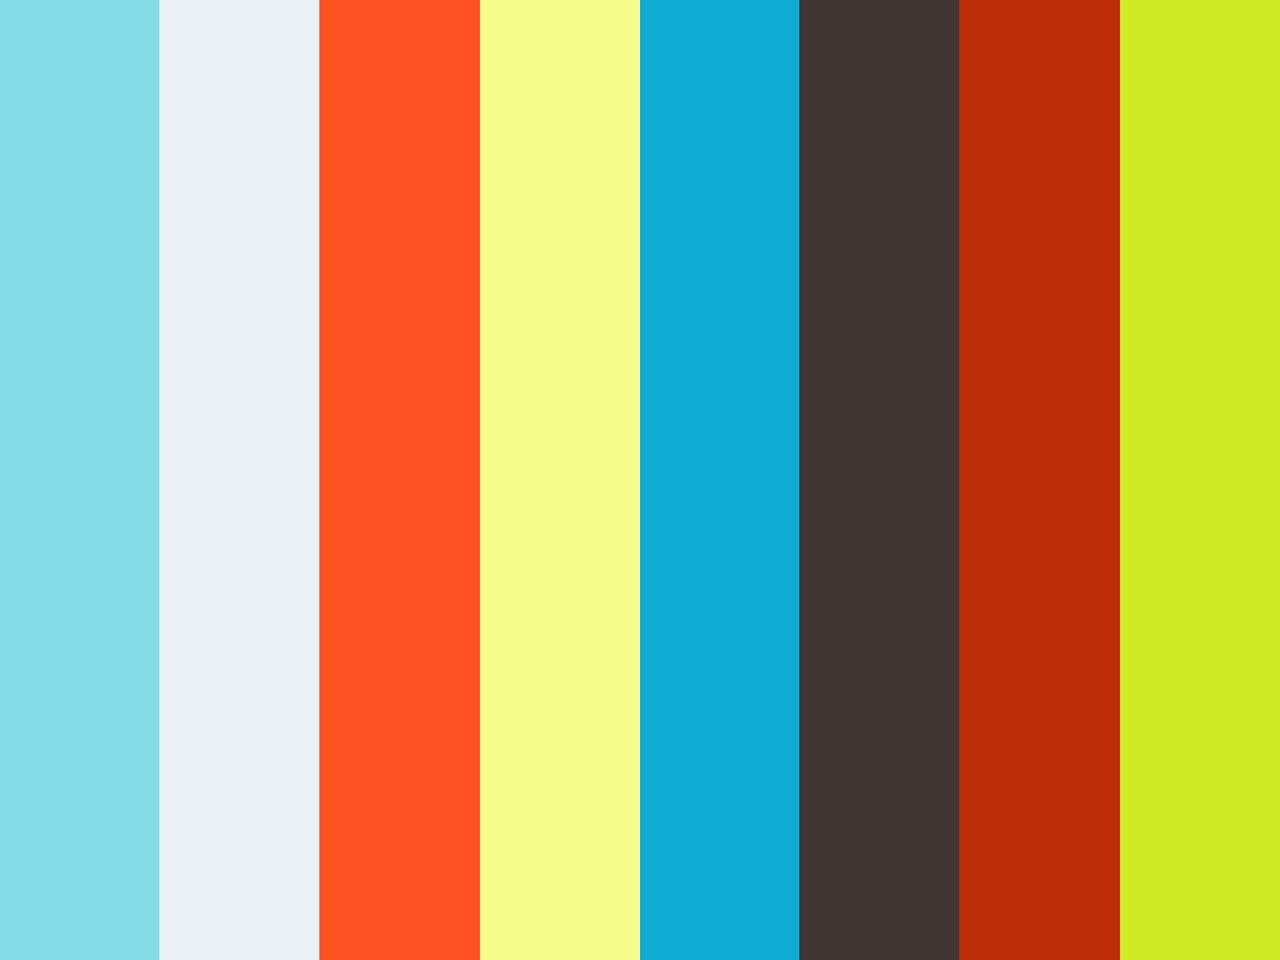 002735 - CORP - Ohlala BehaKlas - Tip 13 - Kleine boezem